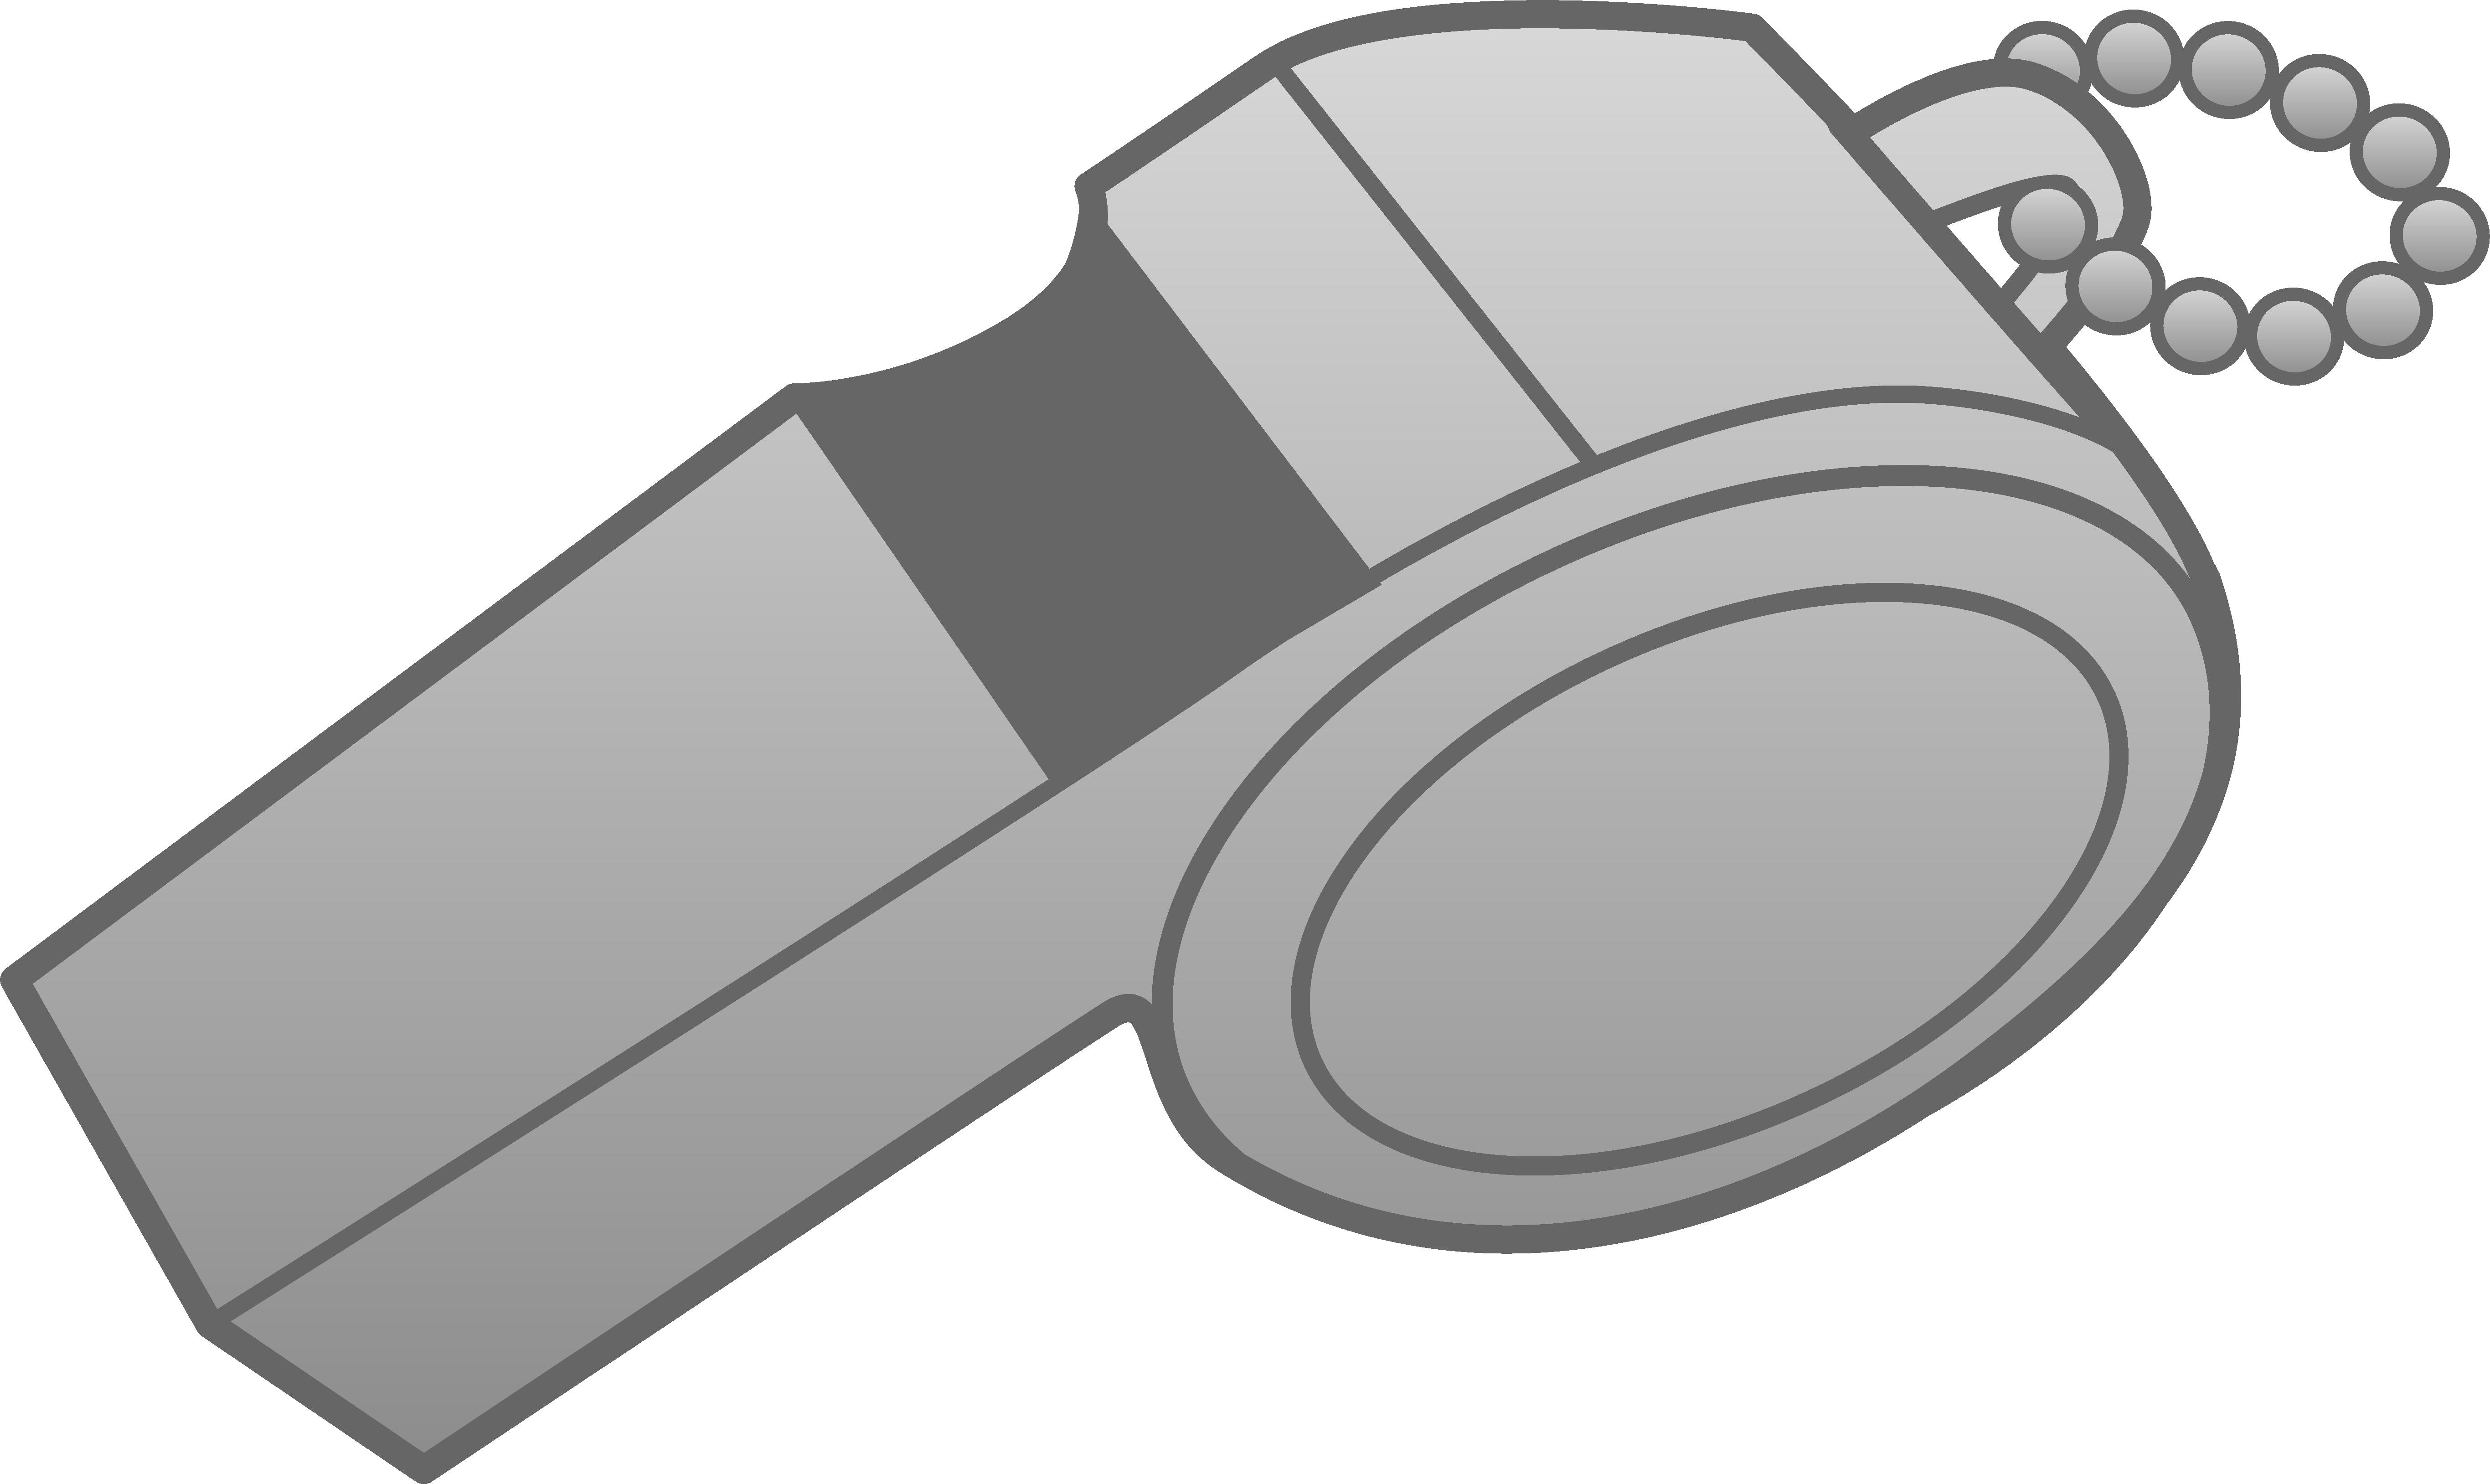 5463x3256 Silver Whistle Design